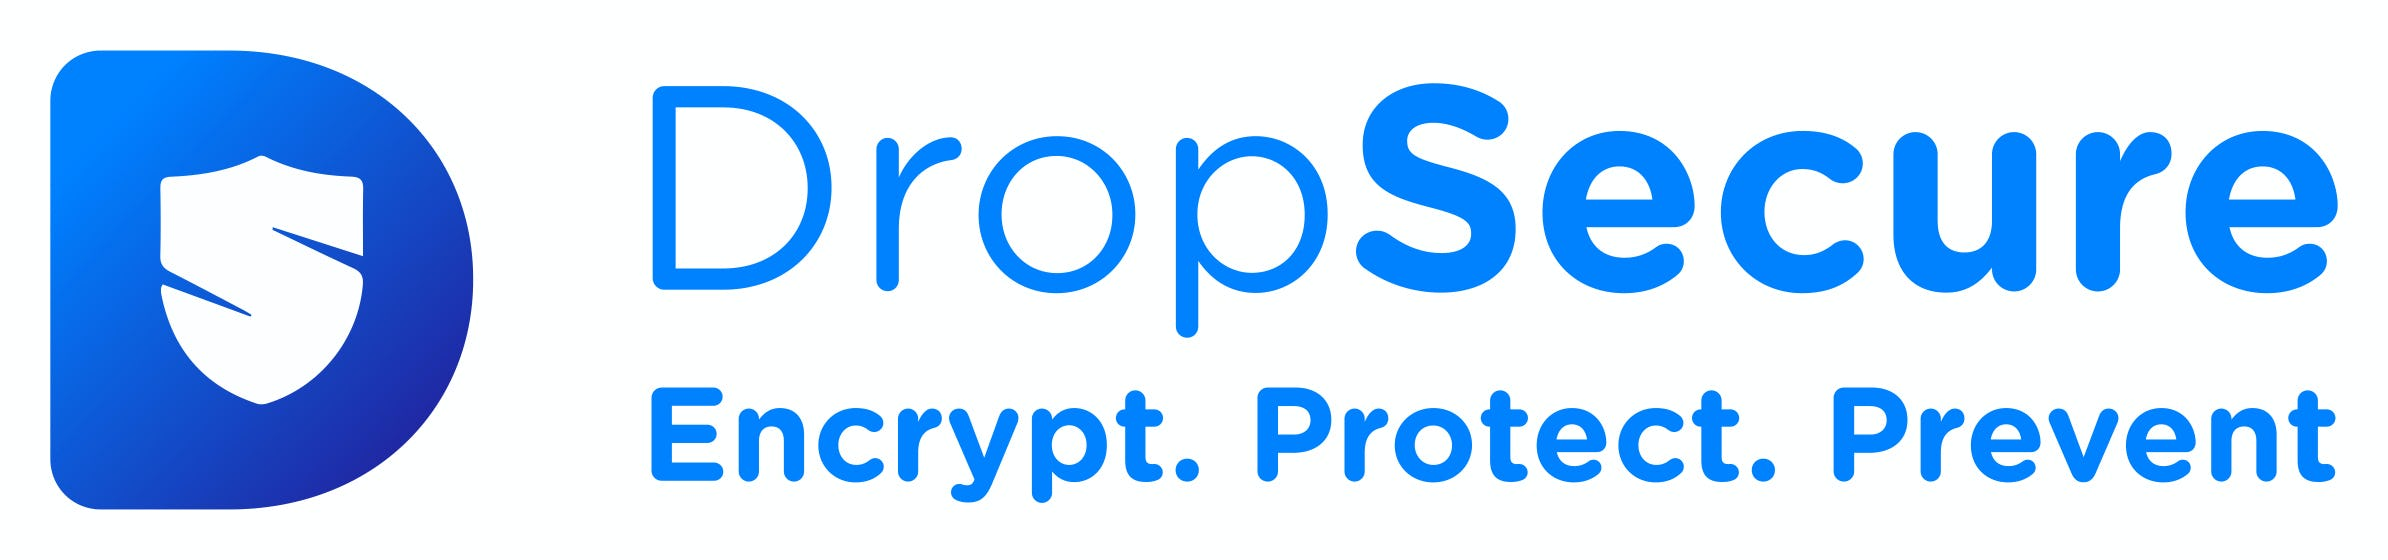 DropSecure